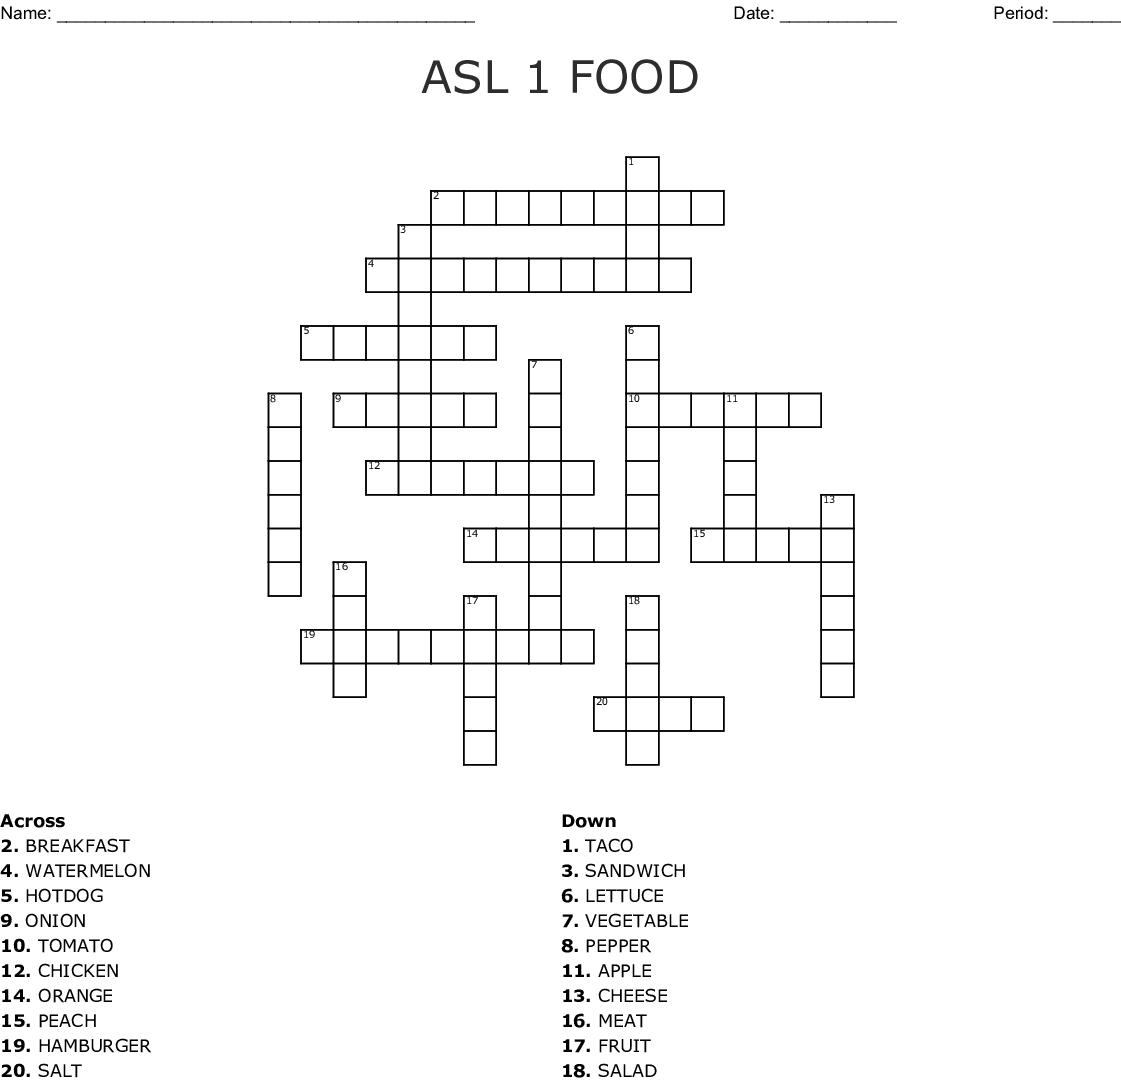 Food and Drinks Bingo Card - WordMint